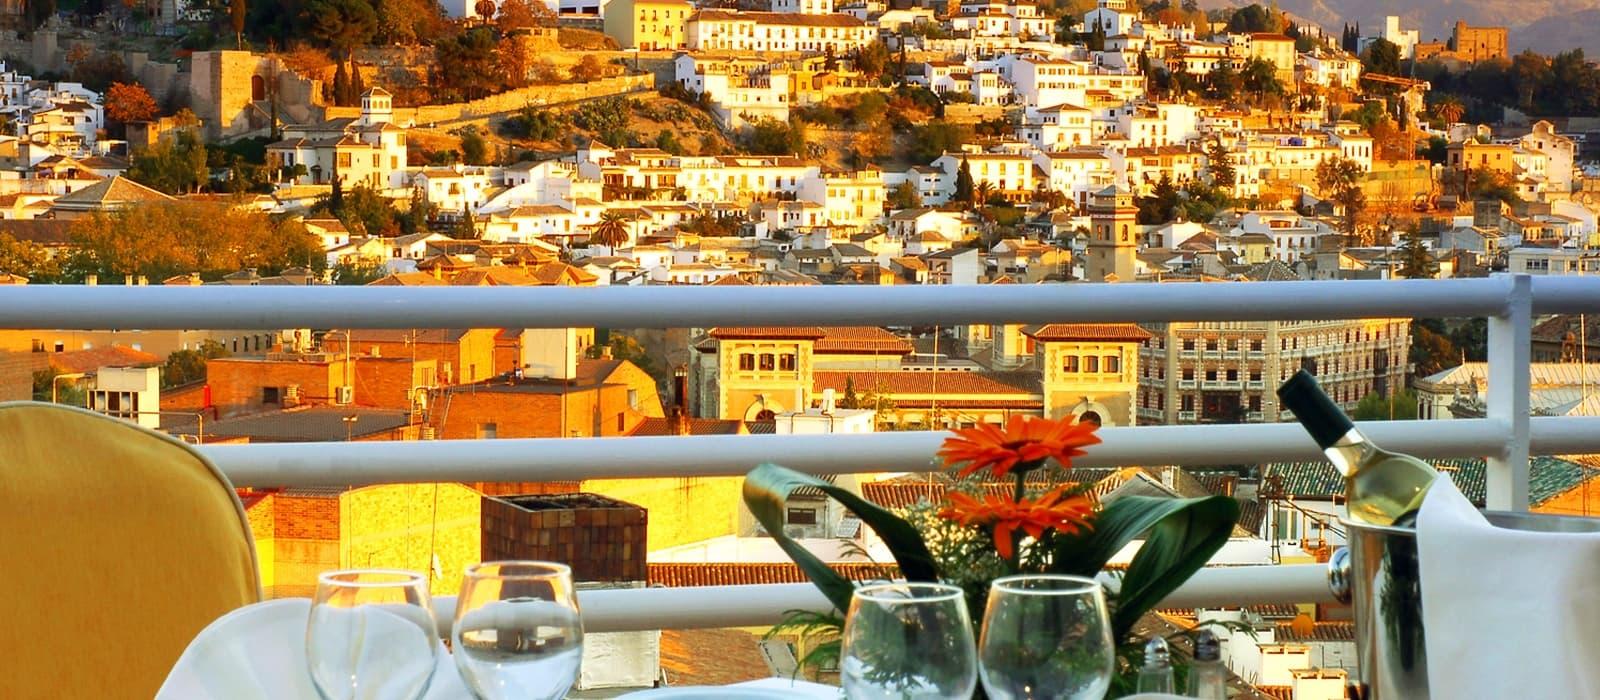 Vincci Granada 4* - Granada